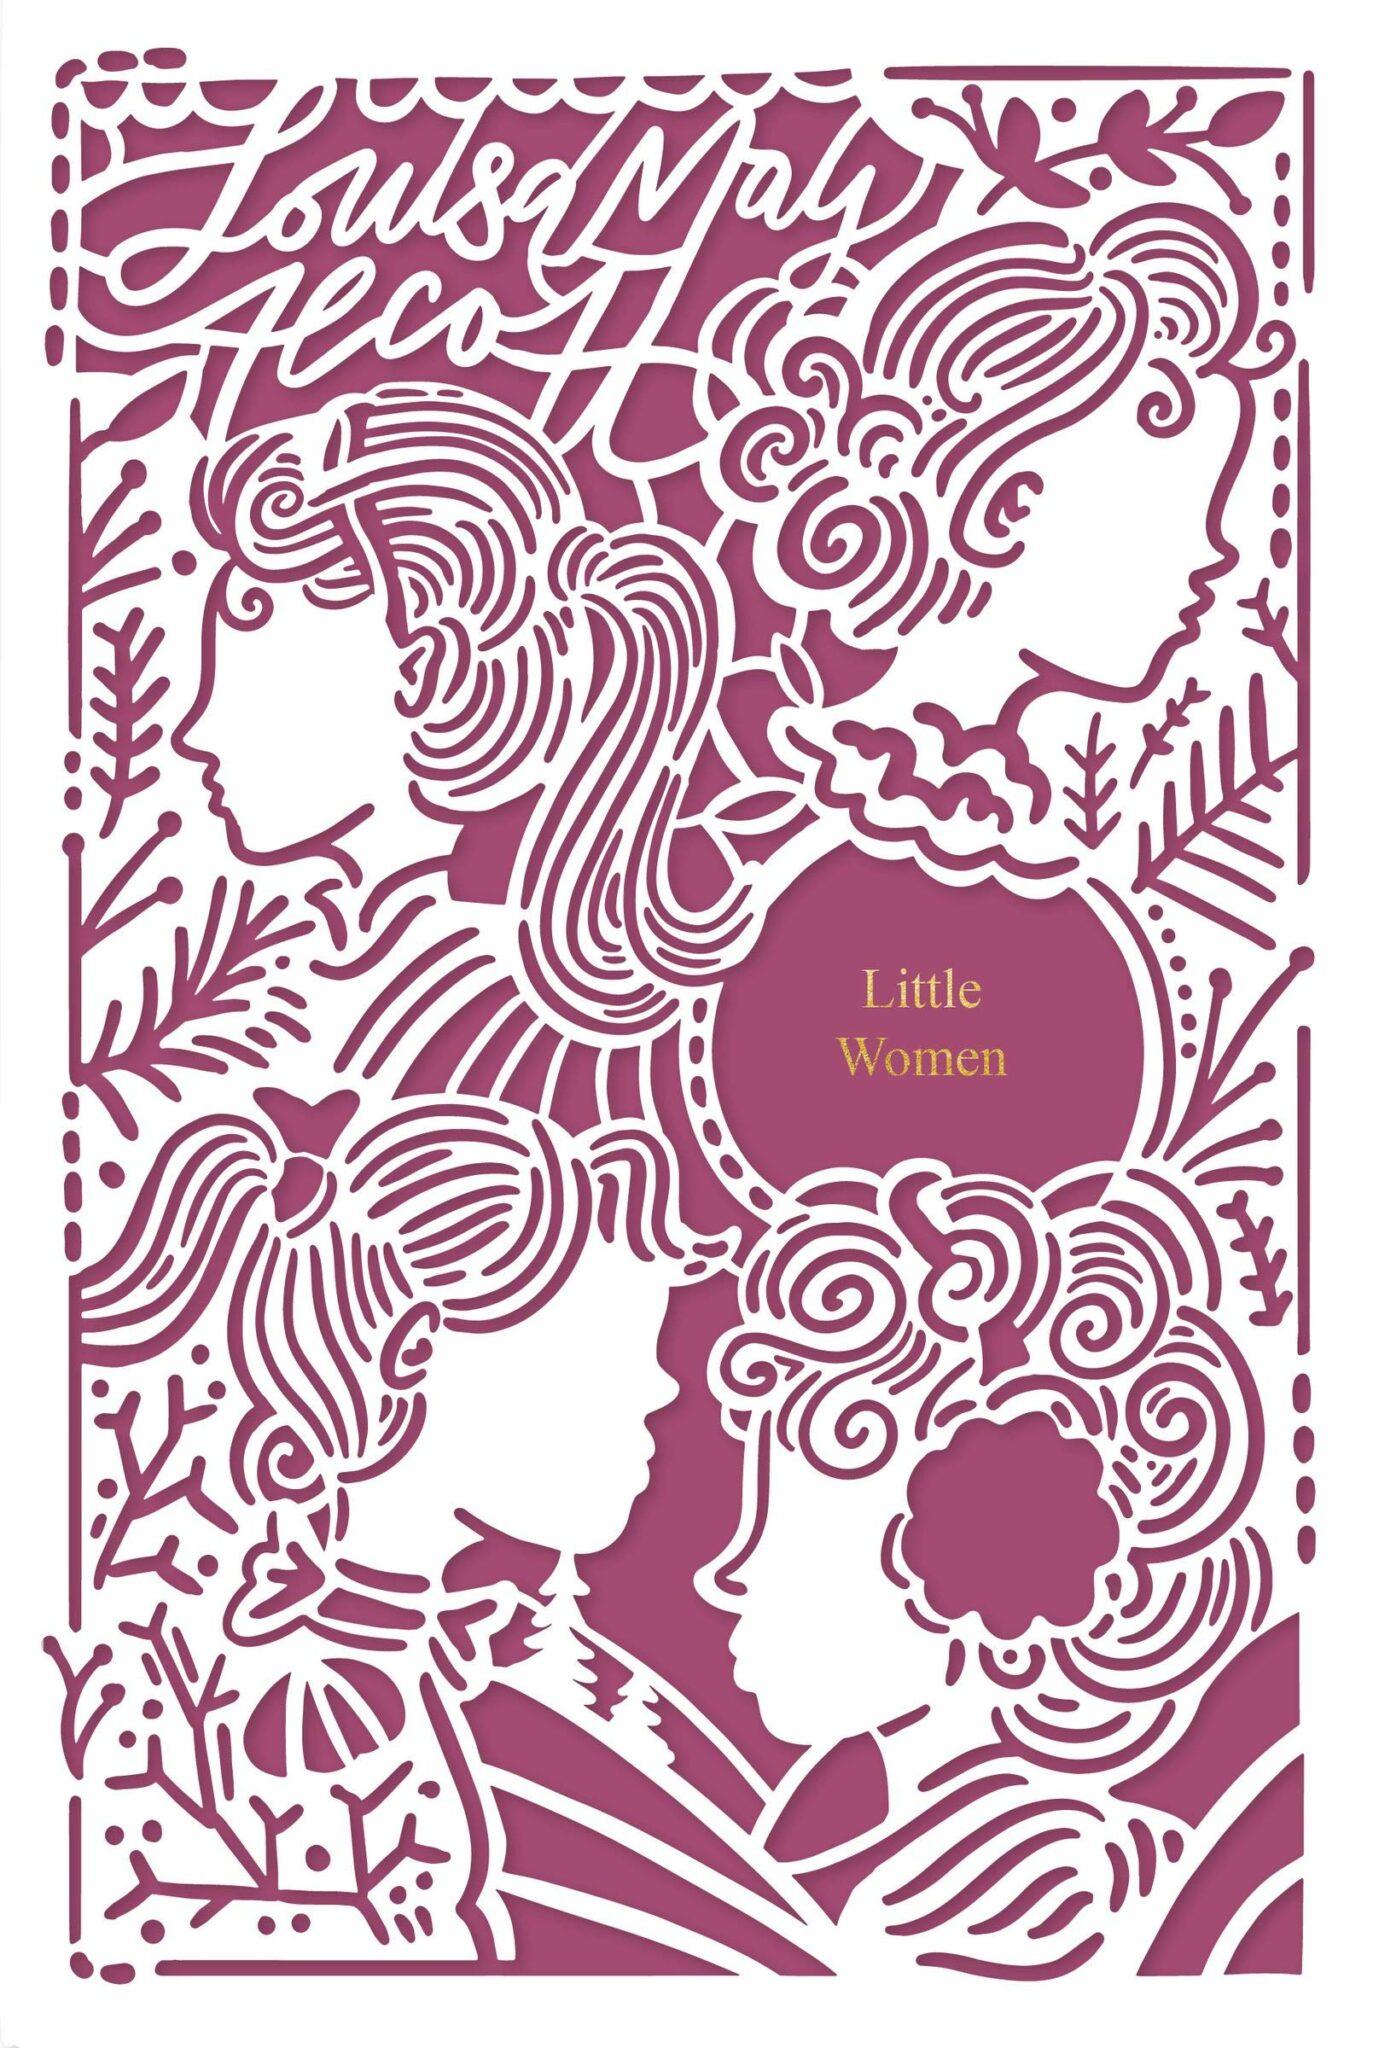 seasons edition louisa may alcott little women cover